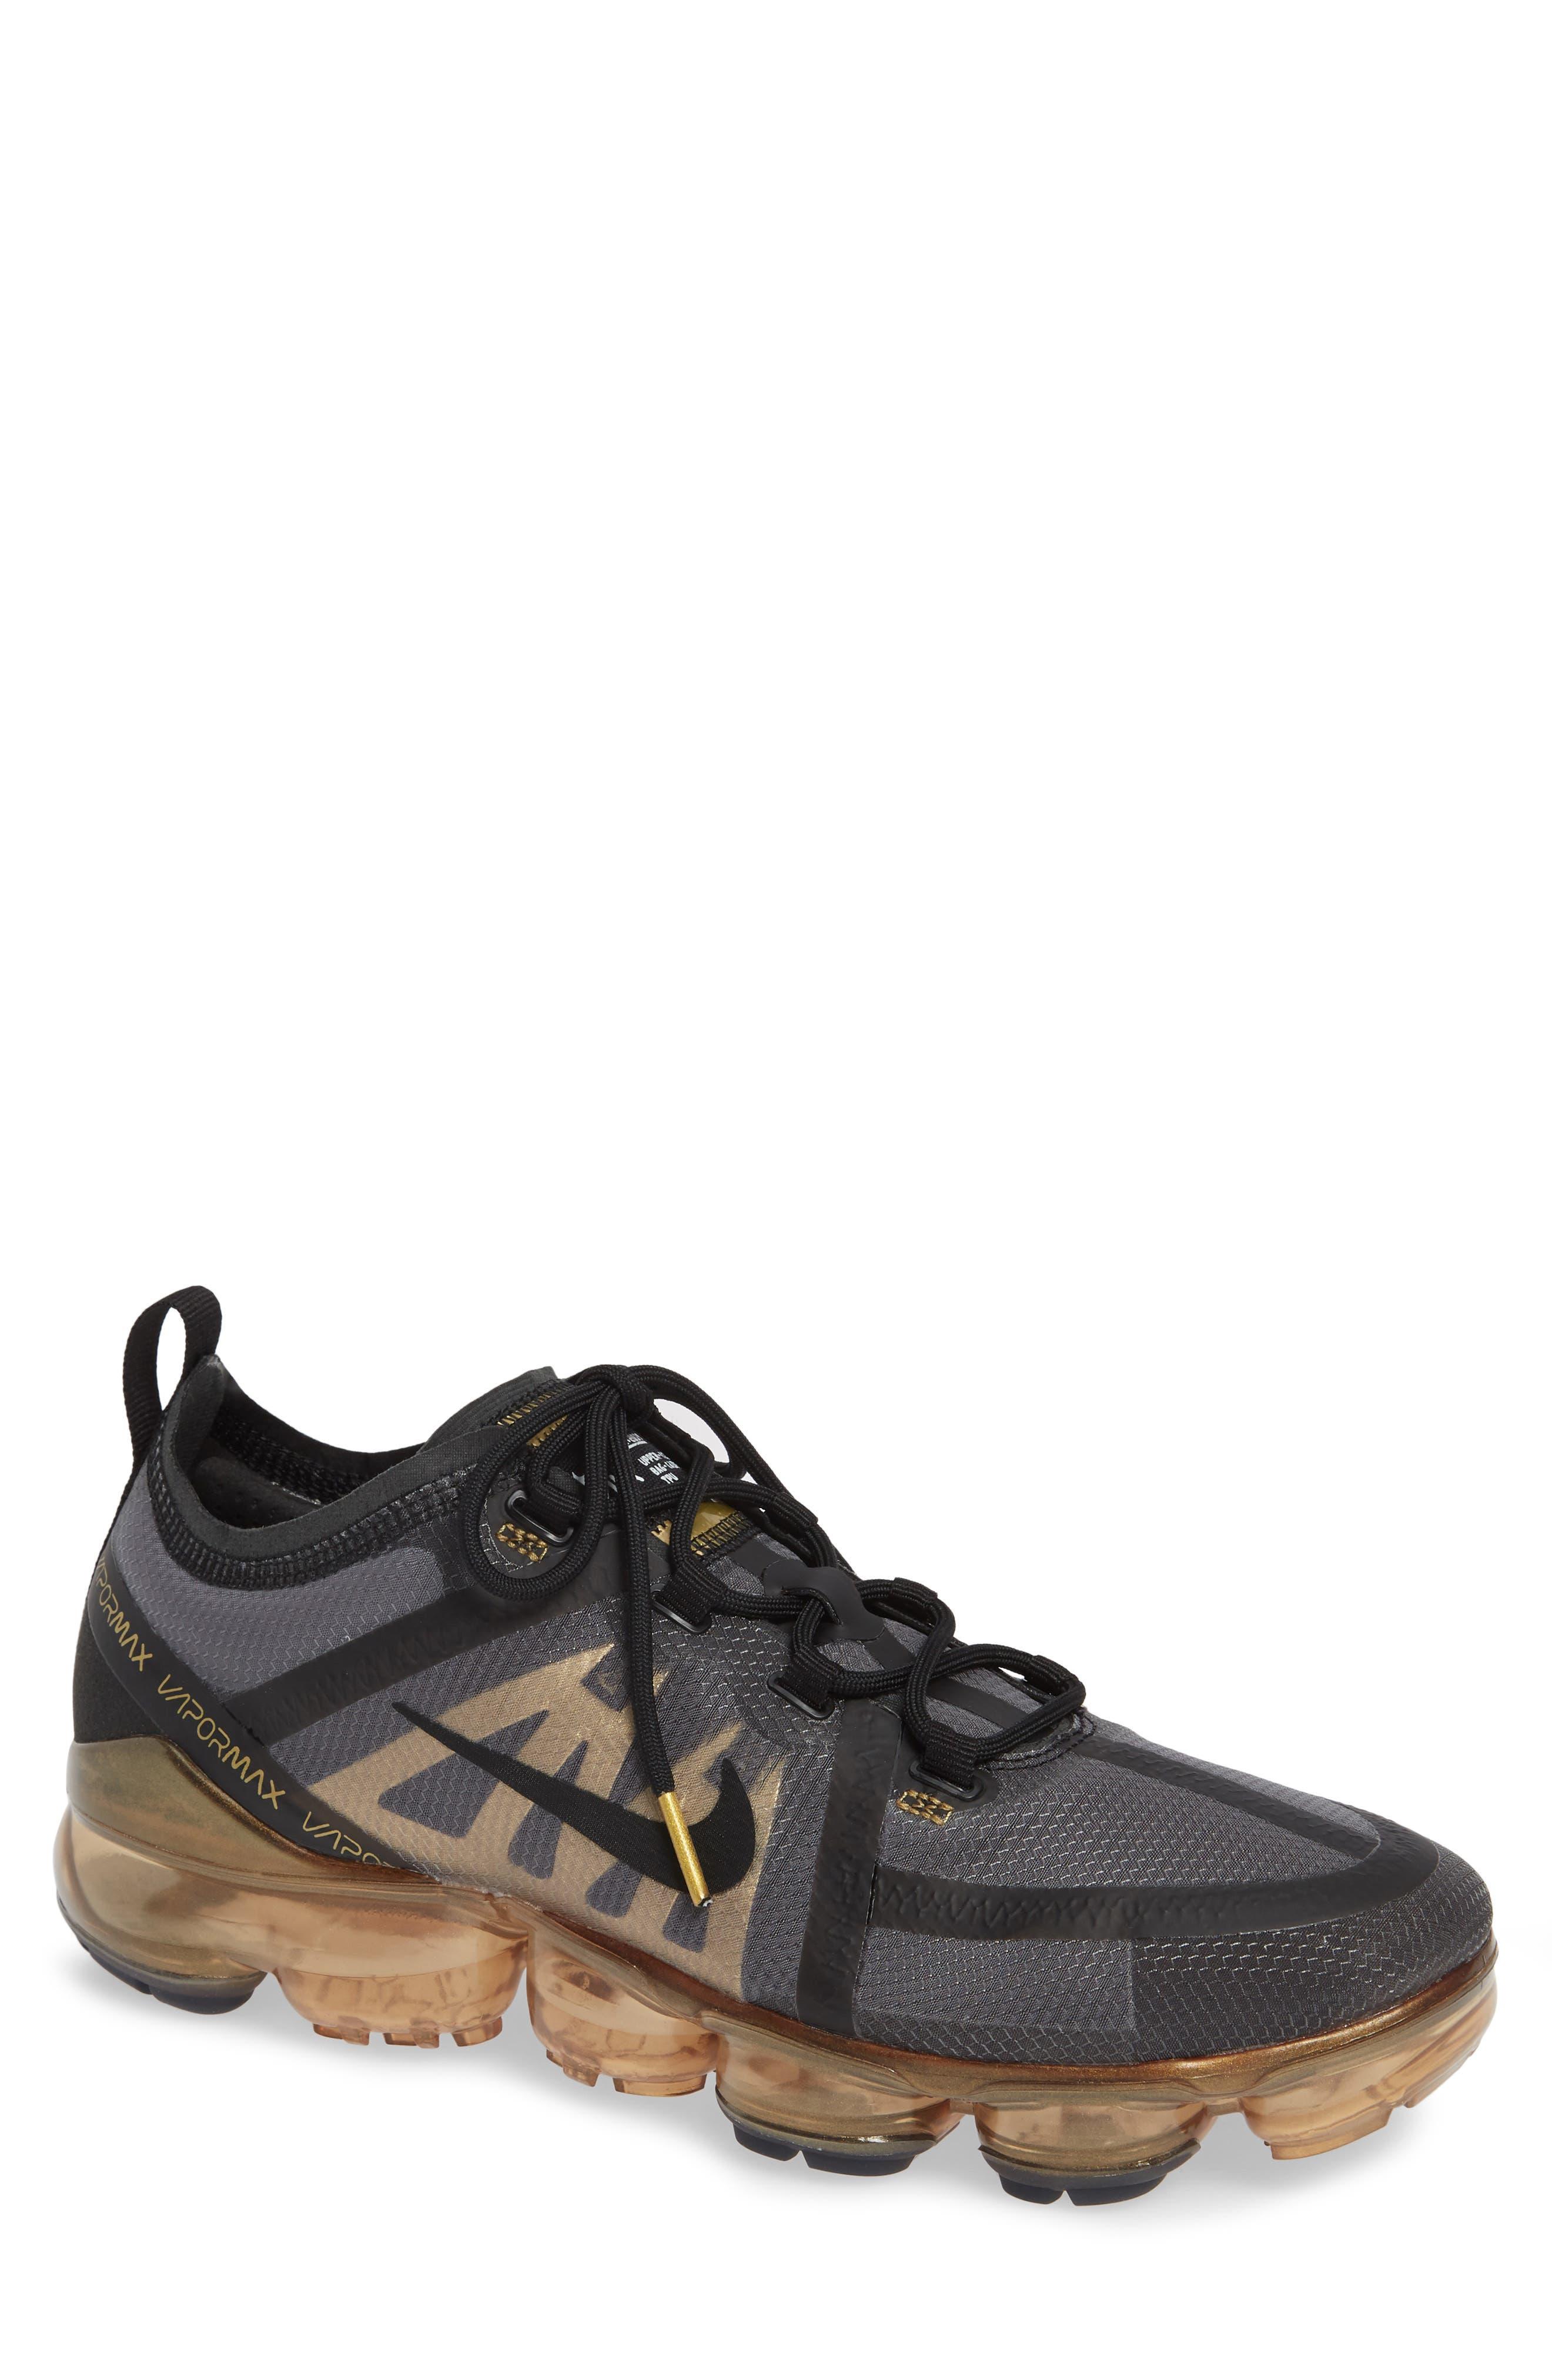 NIKE Air VaporMax 2019 Running Shoe, Main, color, BLACK/ METALLIC GOLD